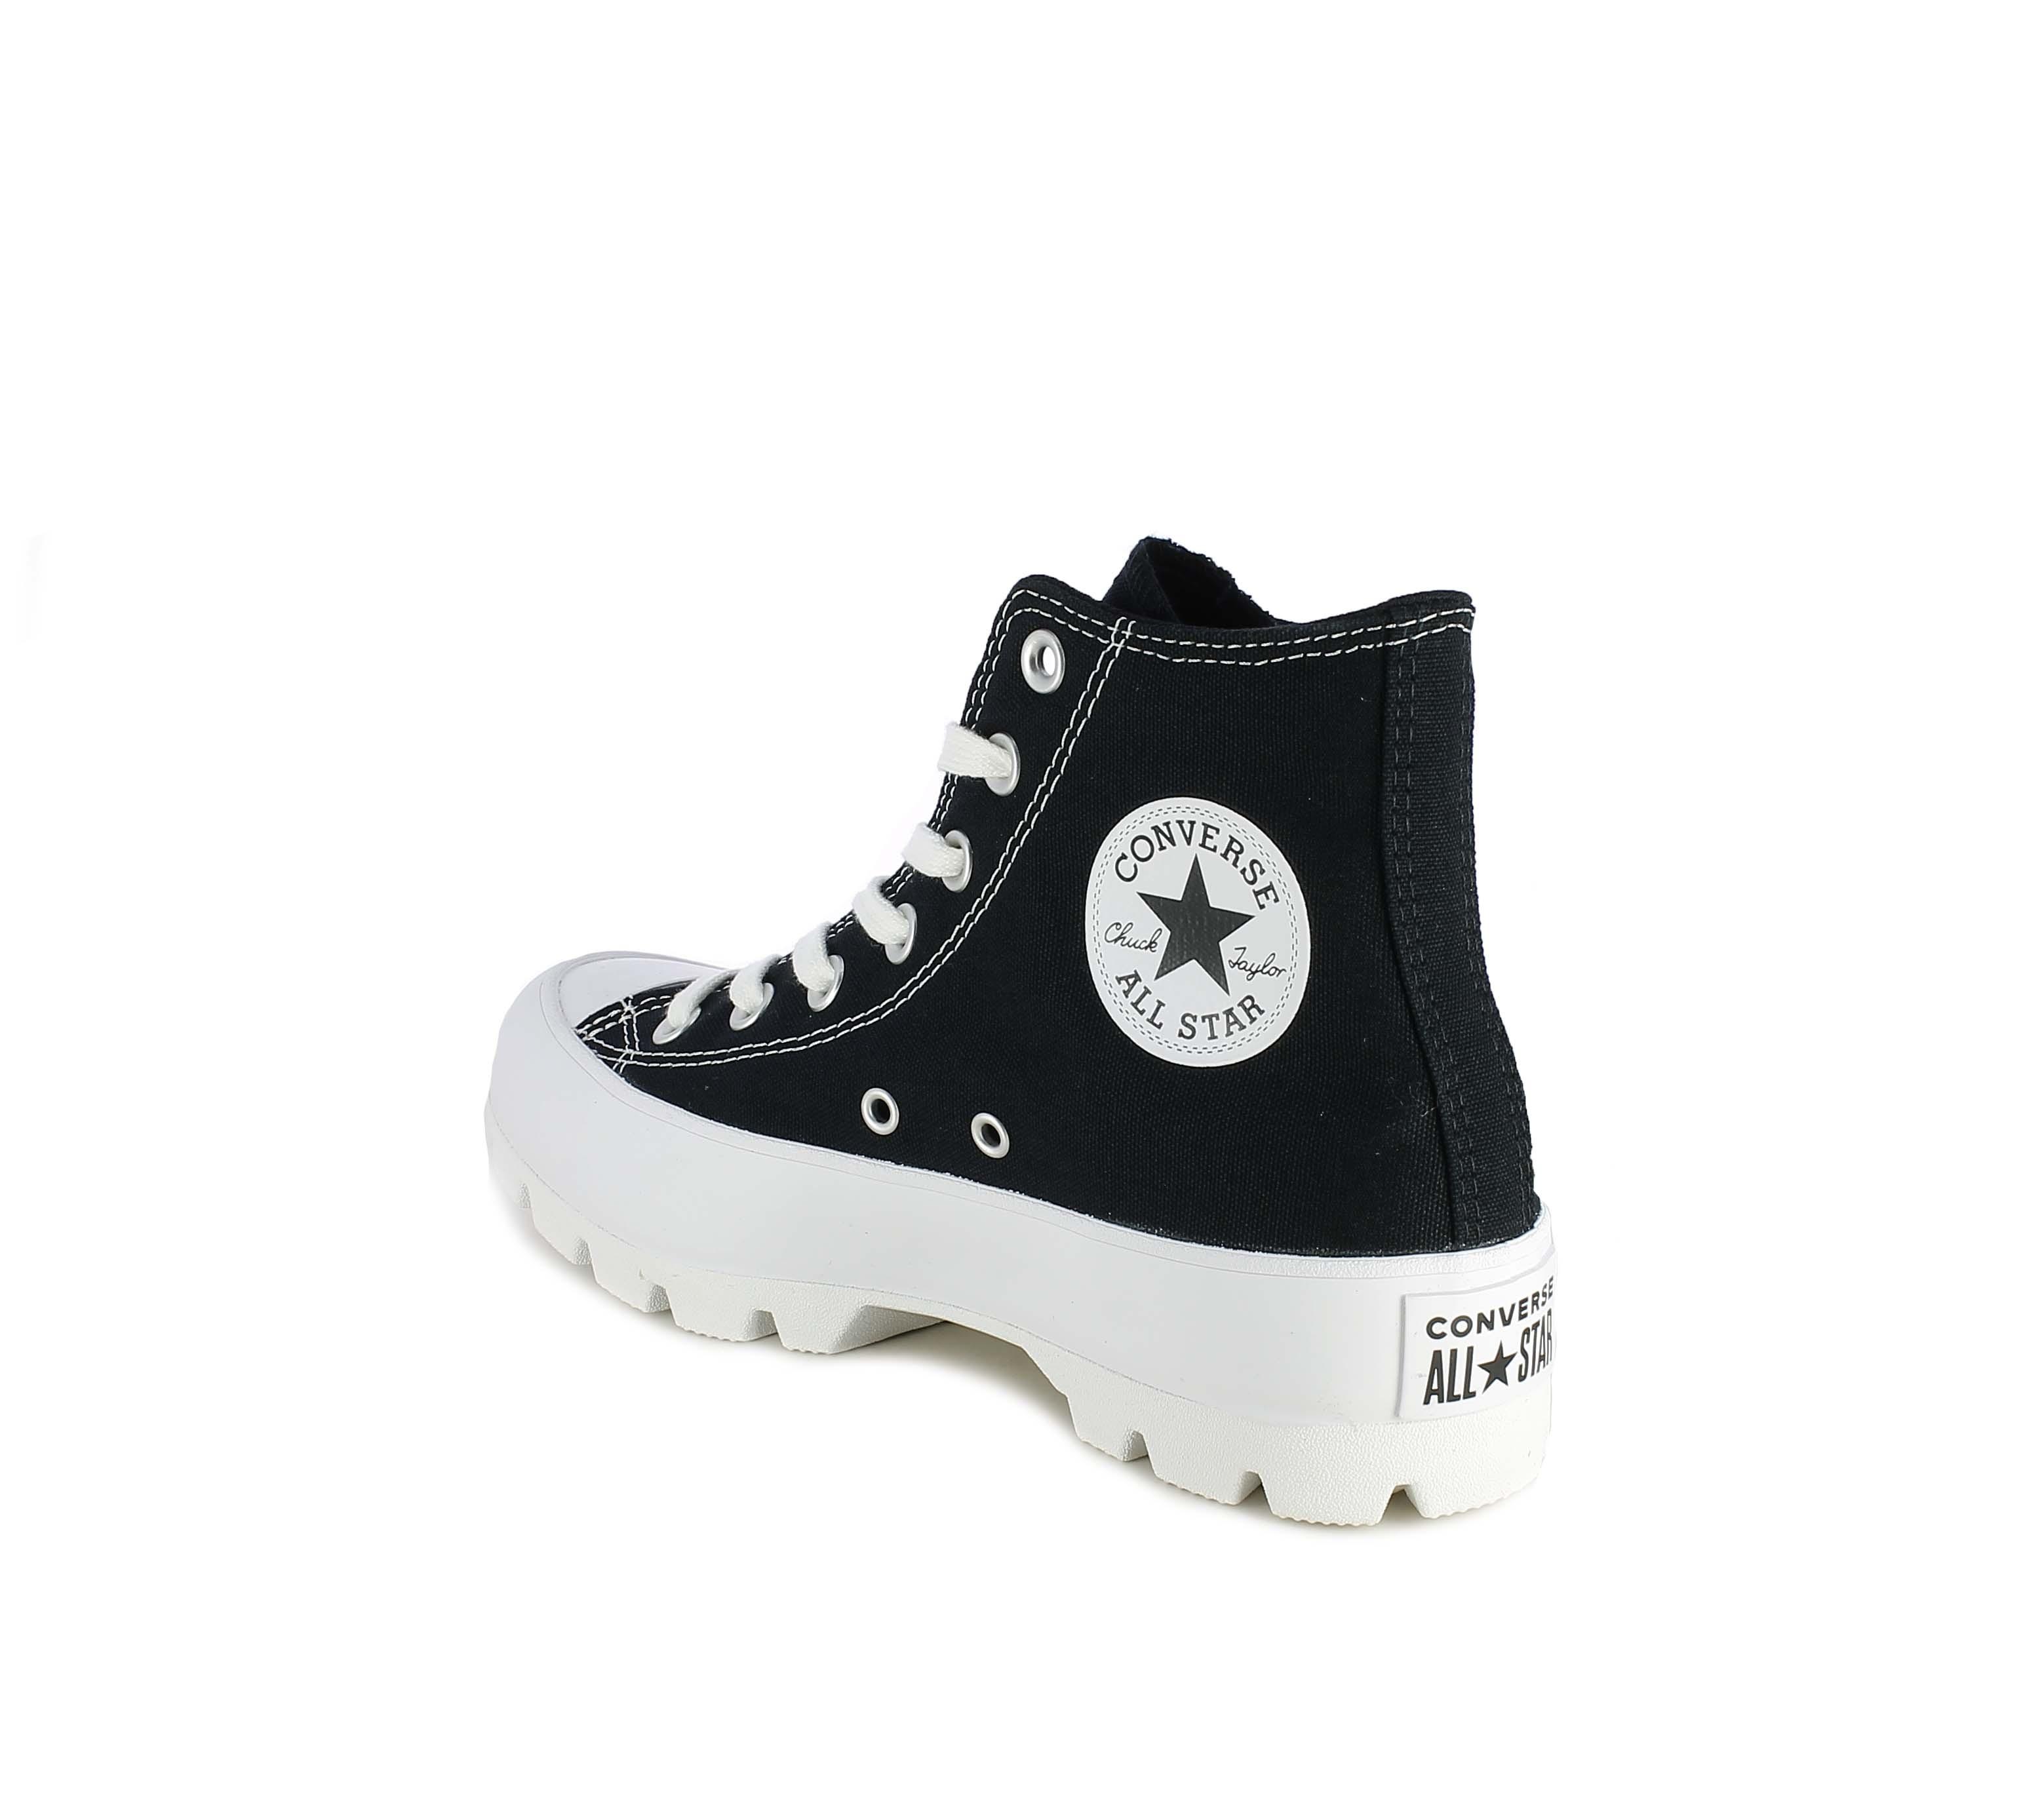 all star converse chuck taylor negras